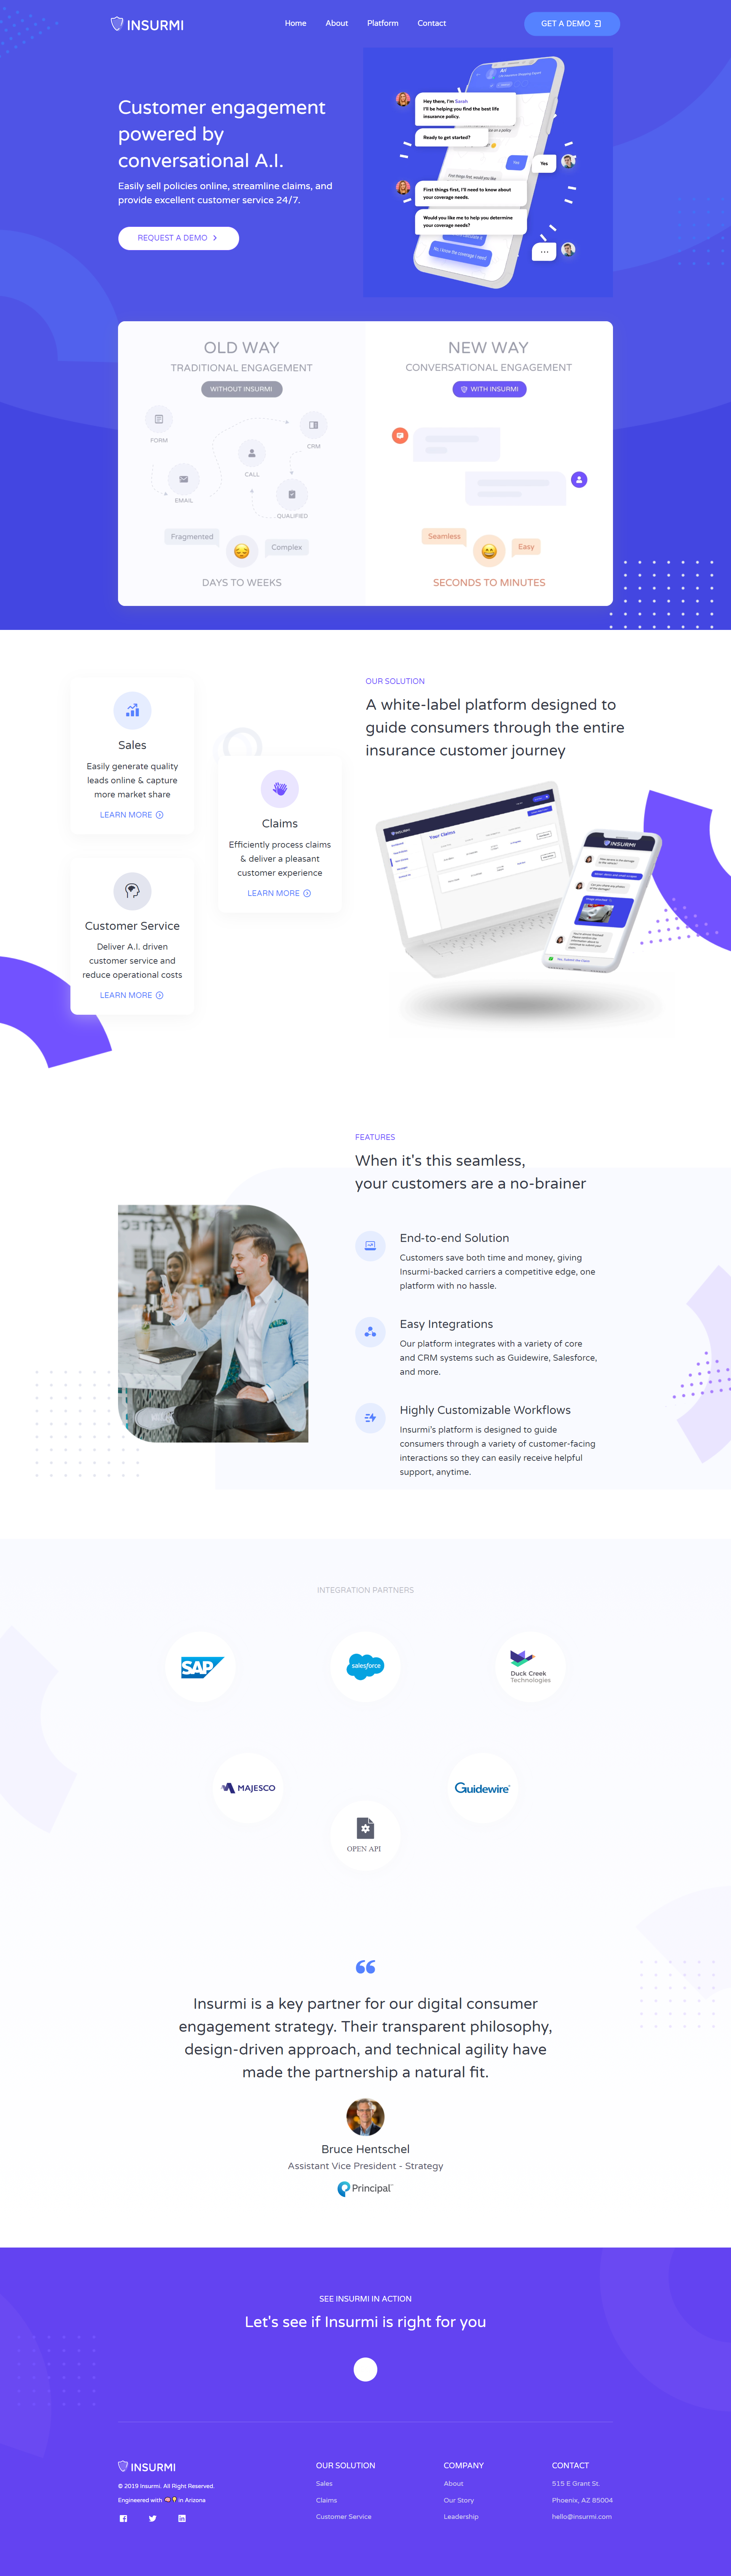 INSURMI Customer engagement, Digital strategy, Digital